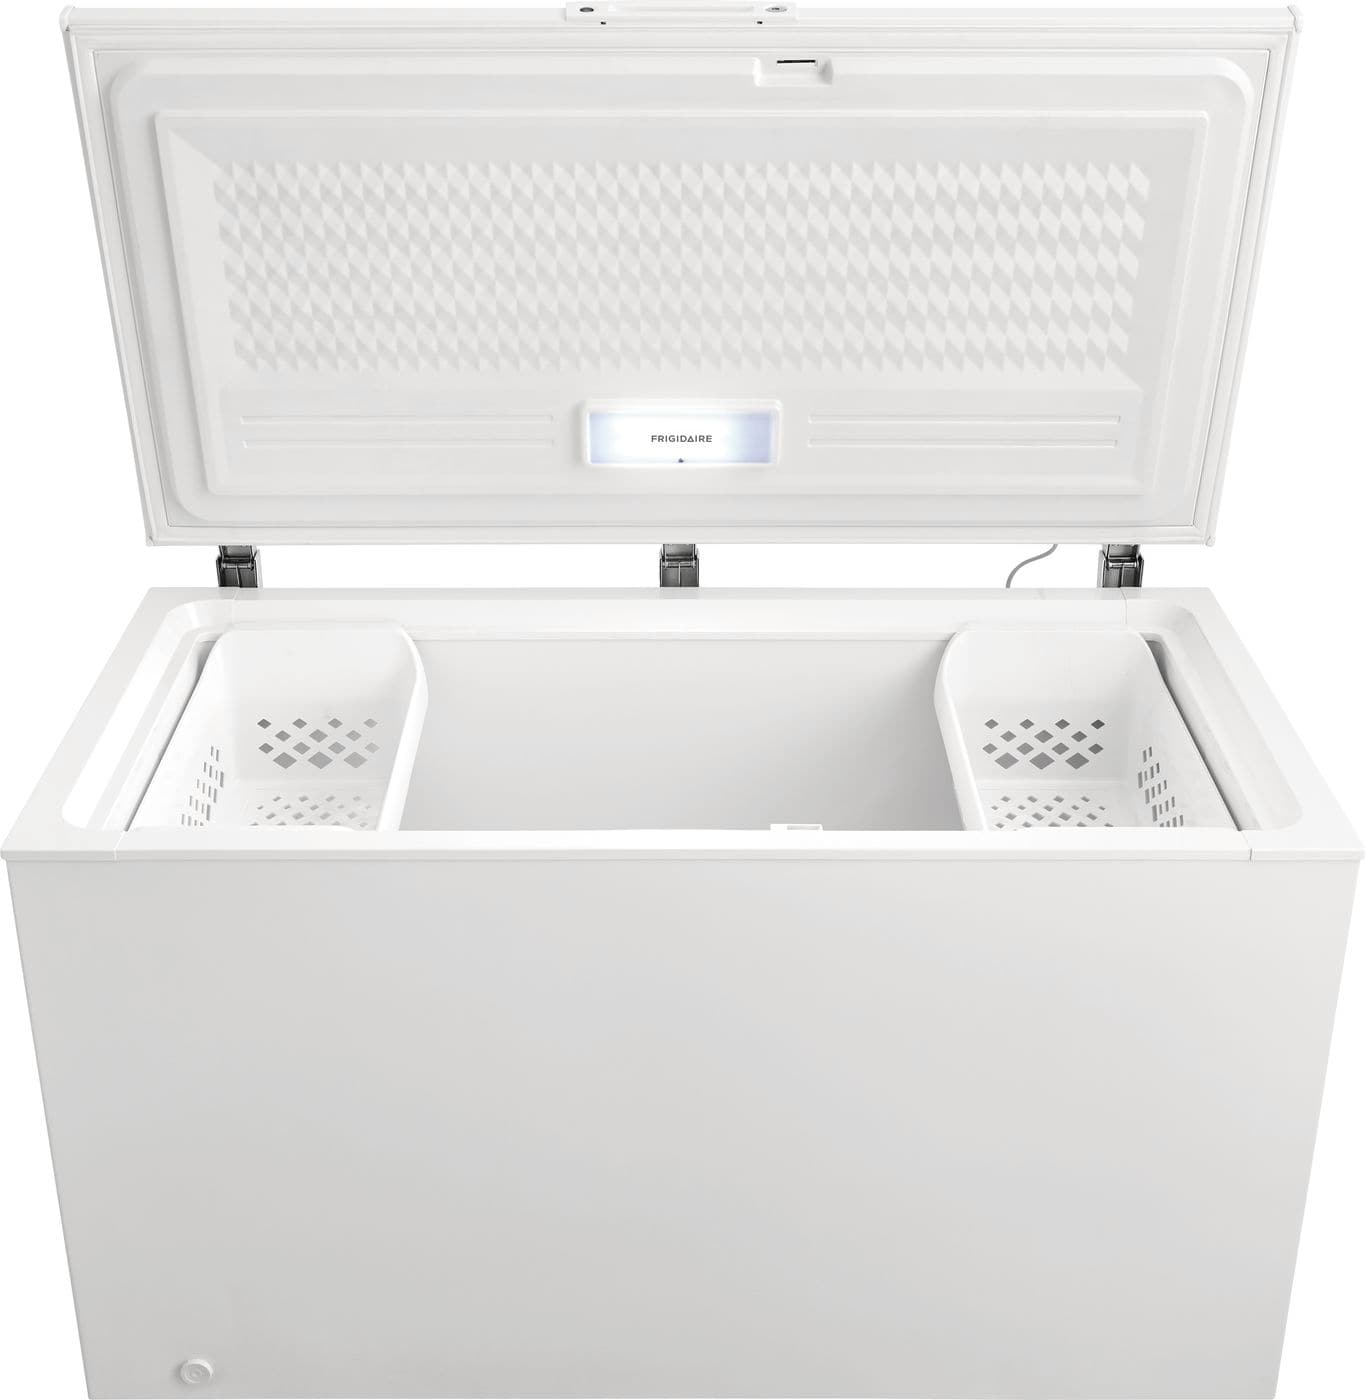 Model: FFFC15M4TW | 14.8 Cu. Ft. Chest Freezer